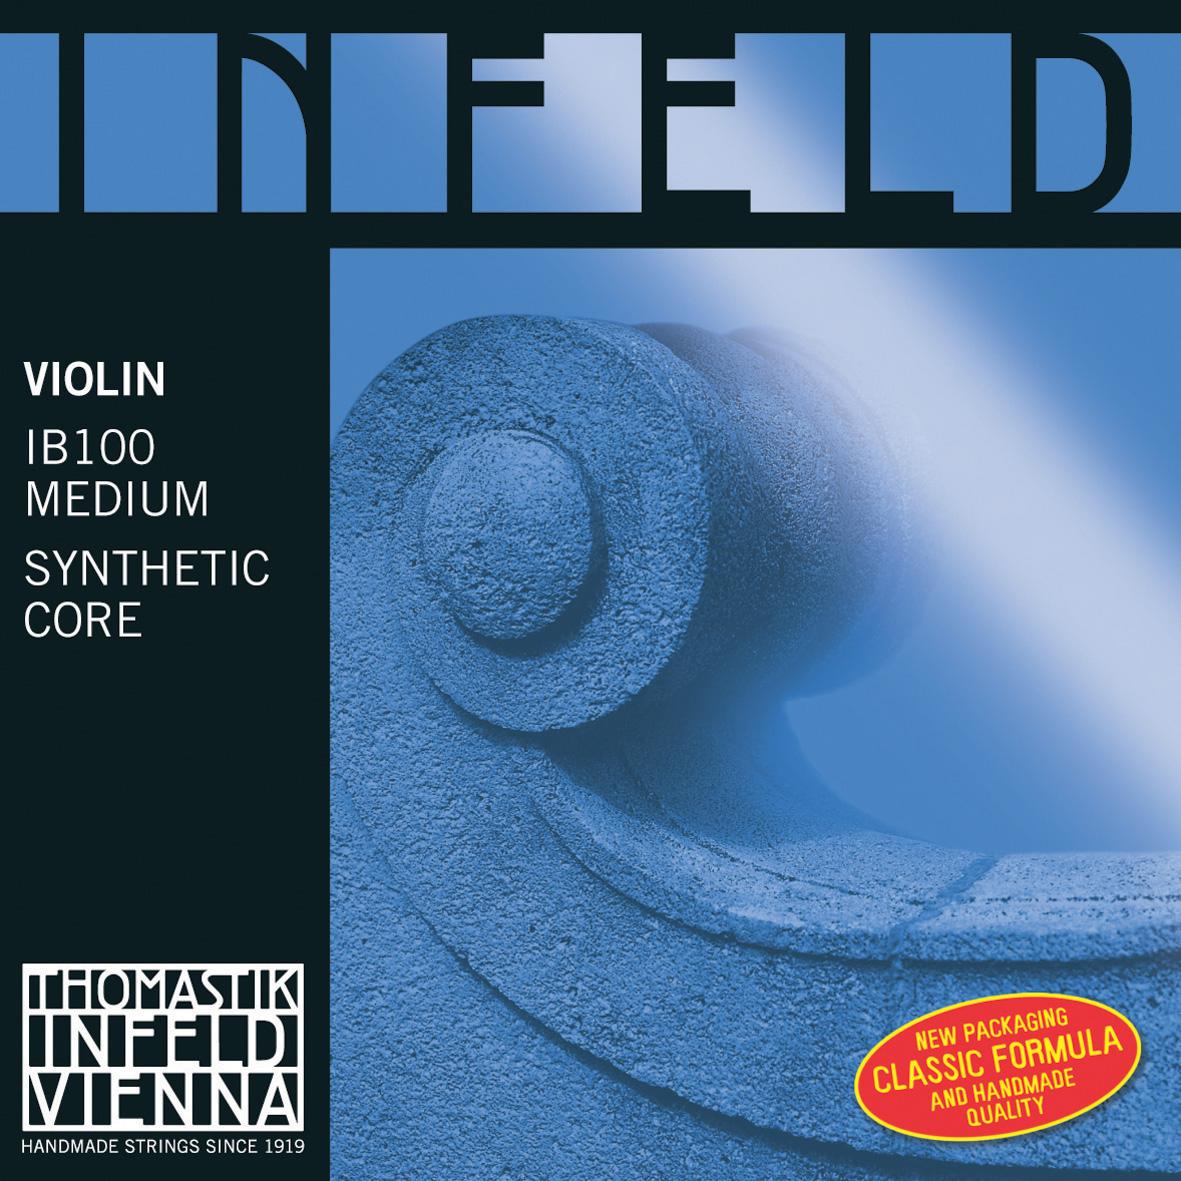 Infeld Blue Thomastik Infeld Strings